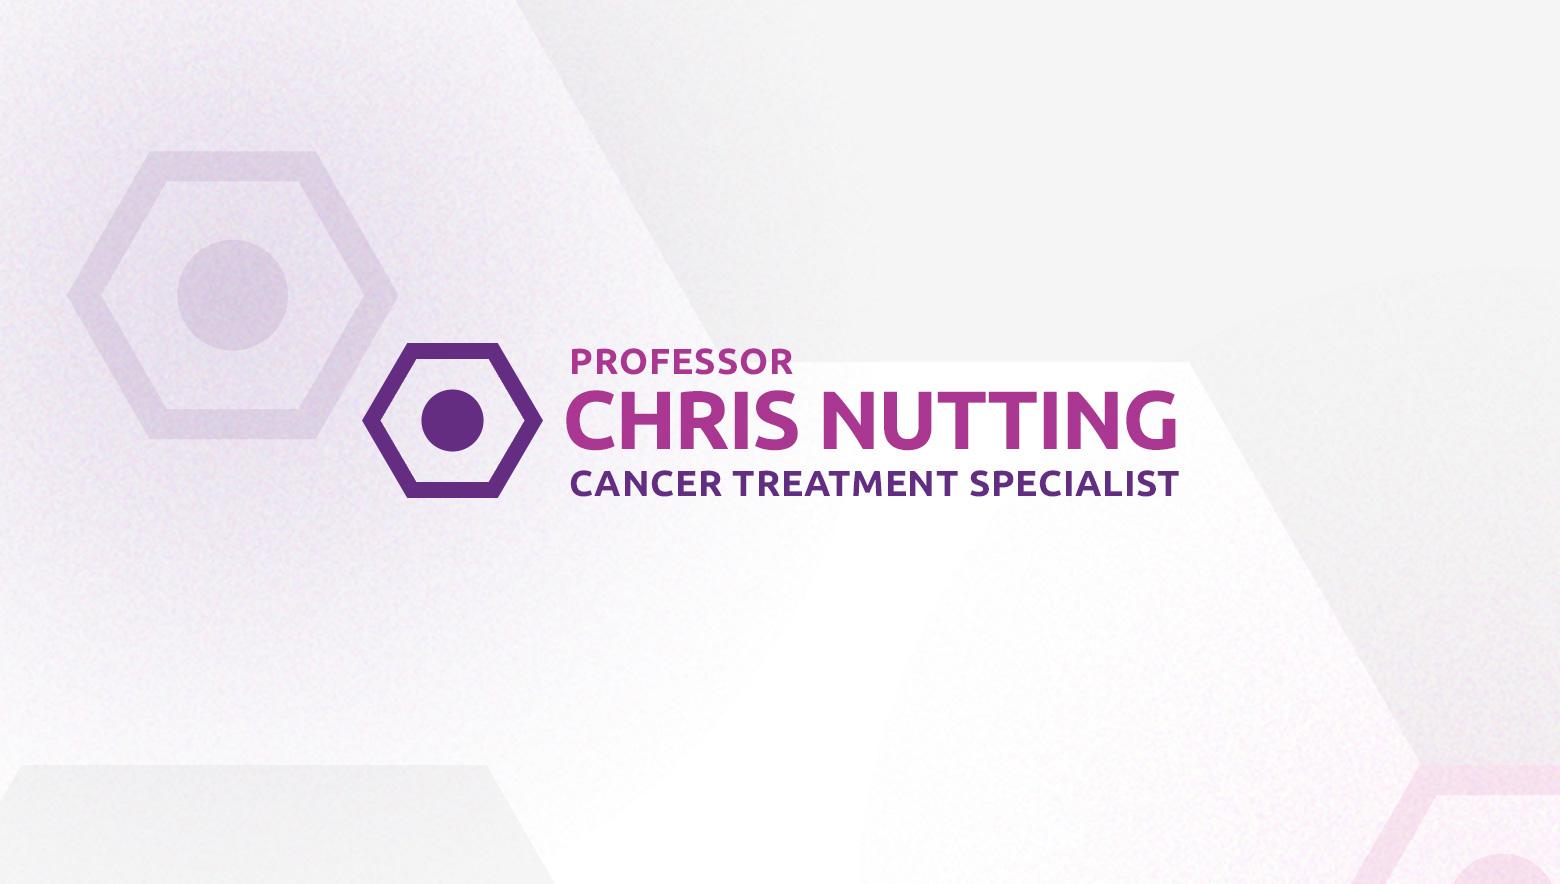 Professor Chris Nutting - Cancer Treatment Specialist